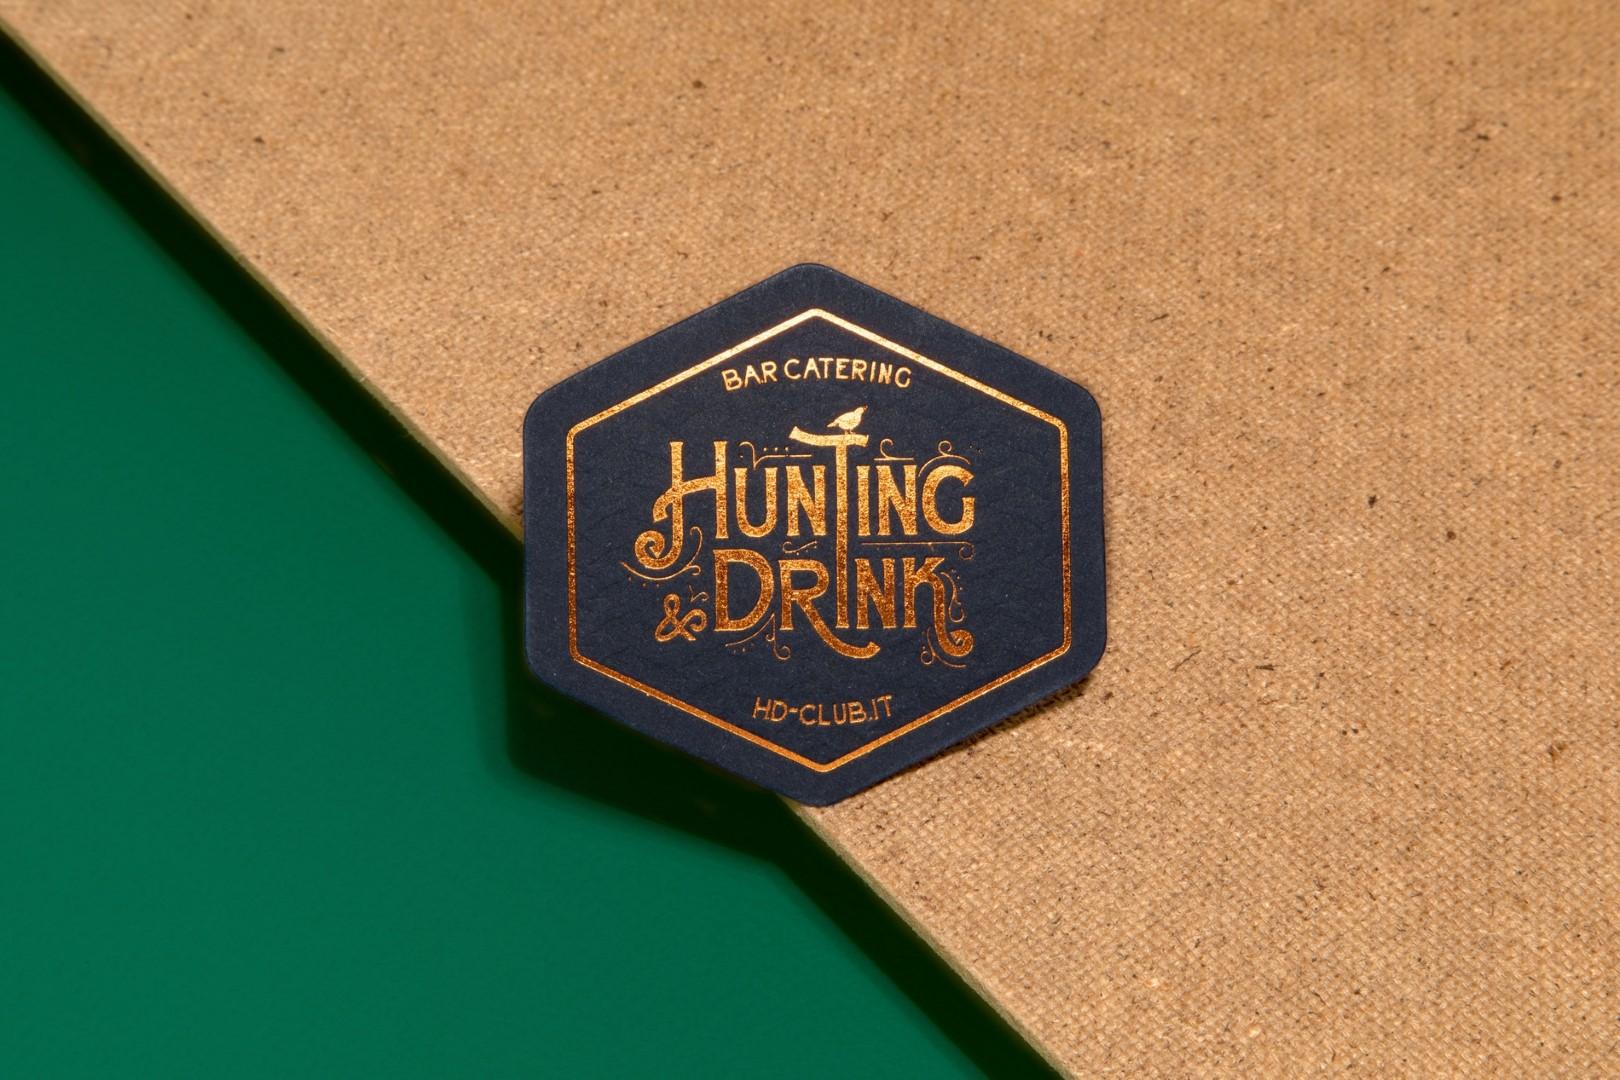 Nostroinchiostro – Hunting Club Drink (1920)